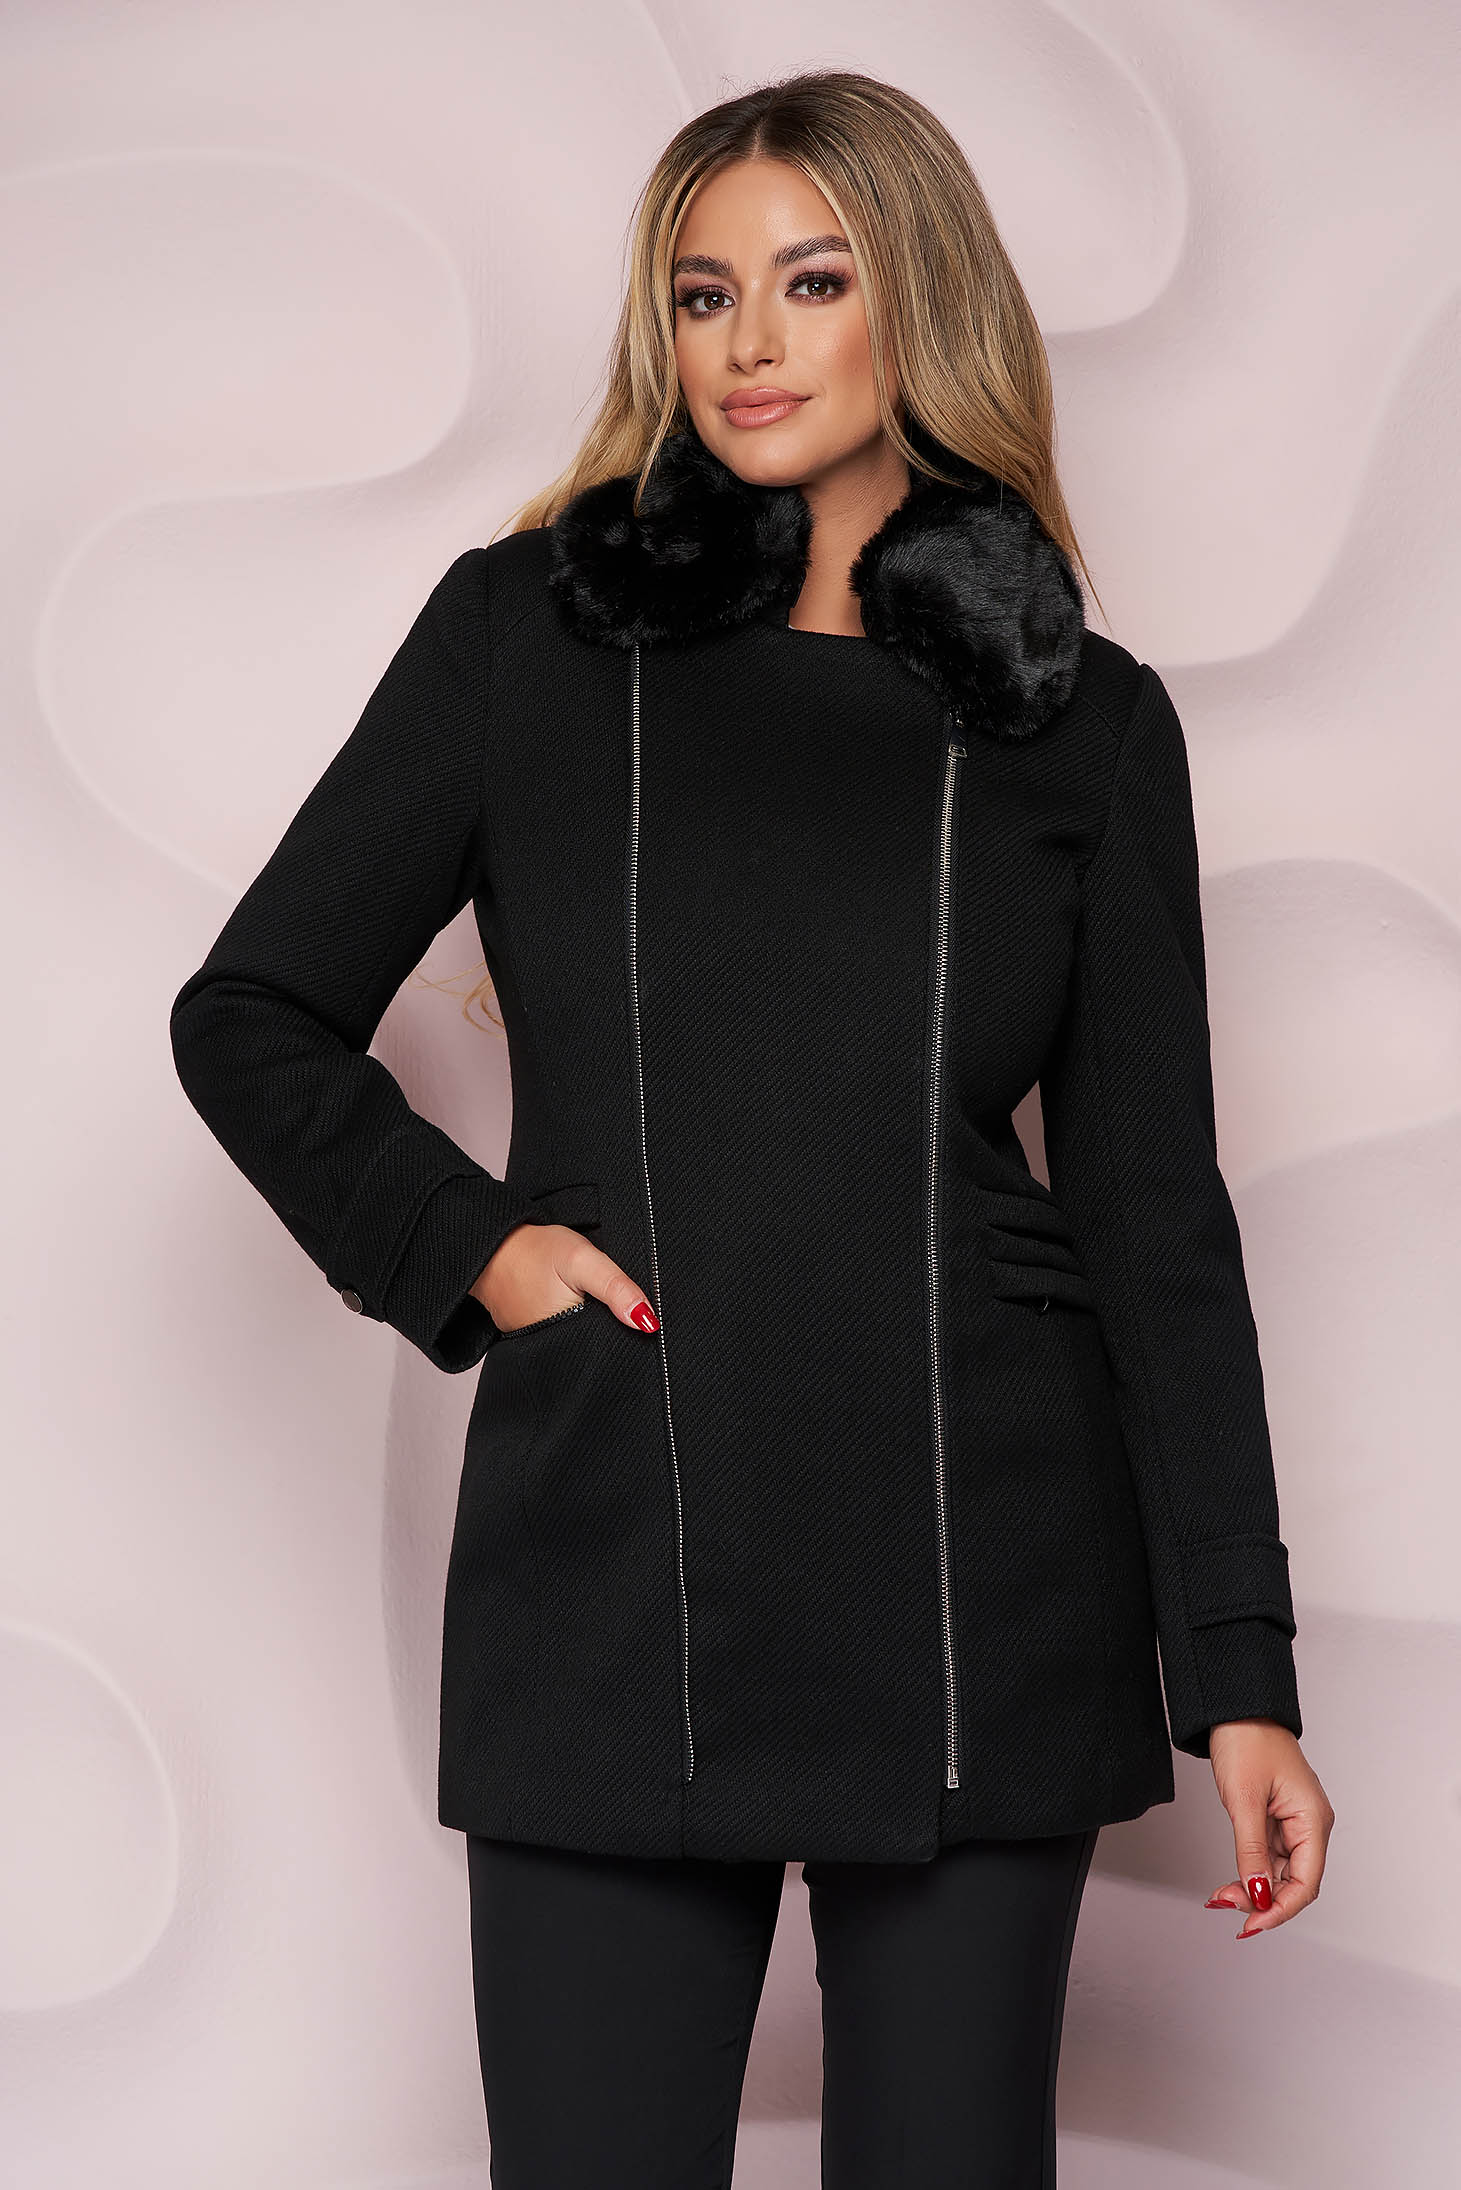 Black coat elegant short cut straight cloth with faux fur accessory